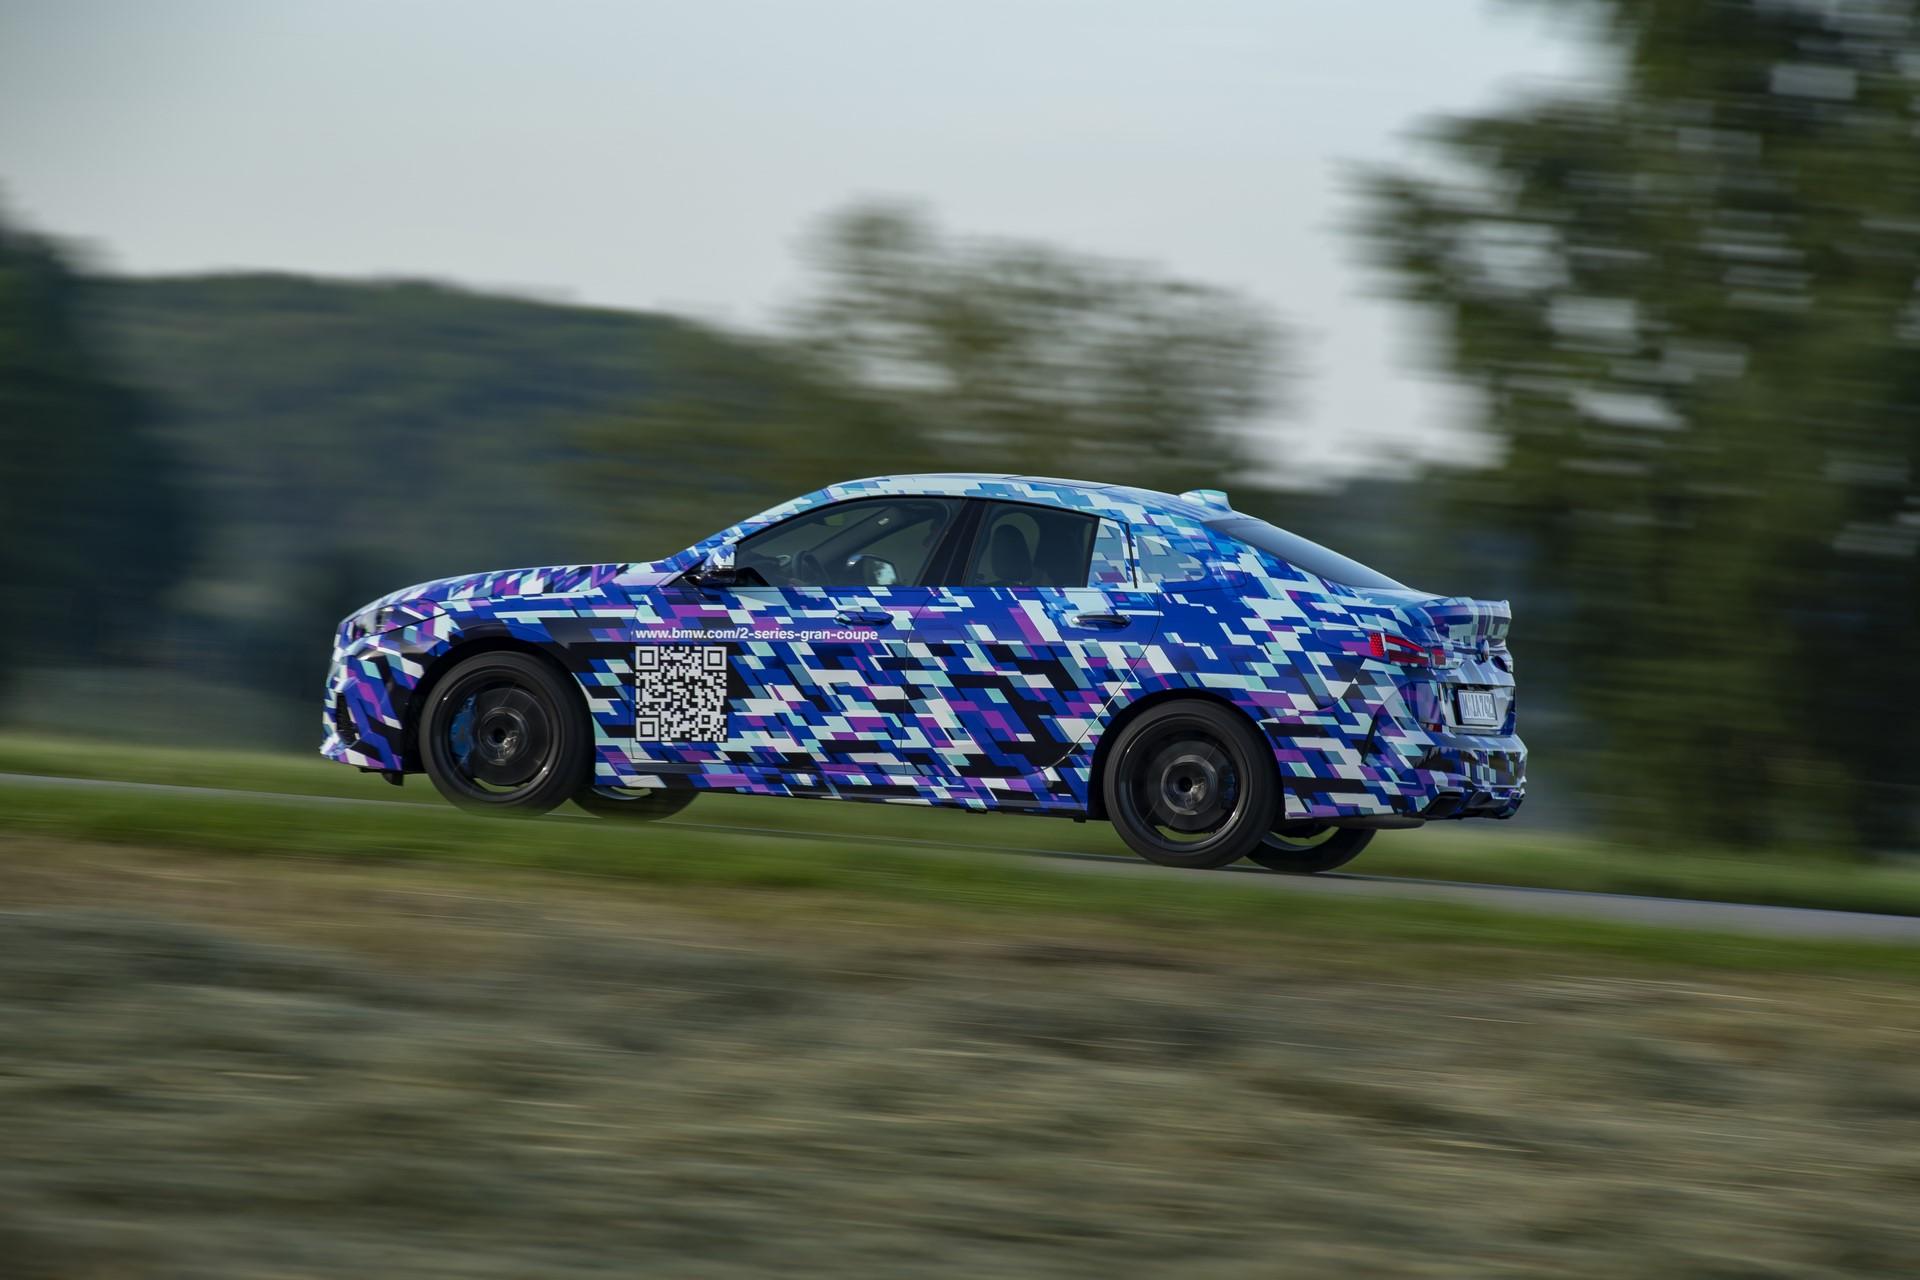 BMW-2-Series-Gran-Coupe-2020-spy-photos-10